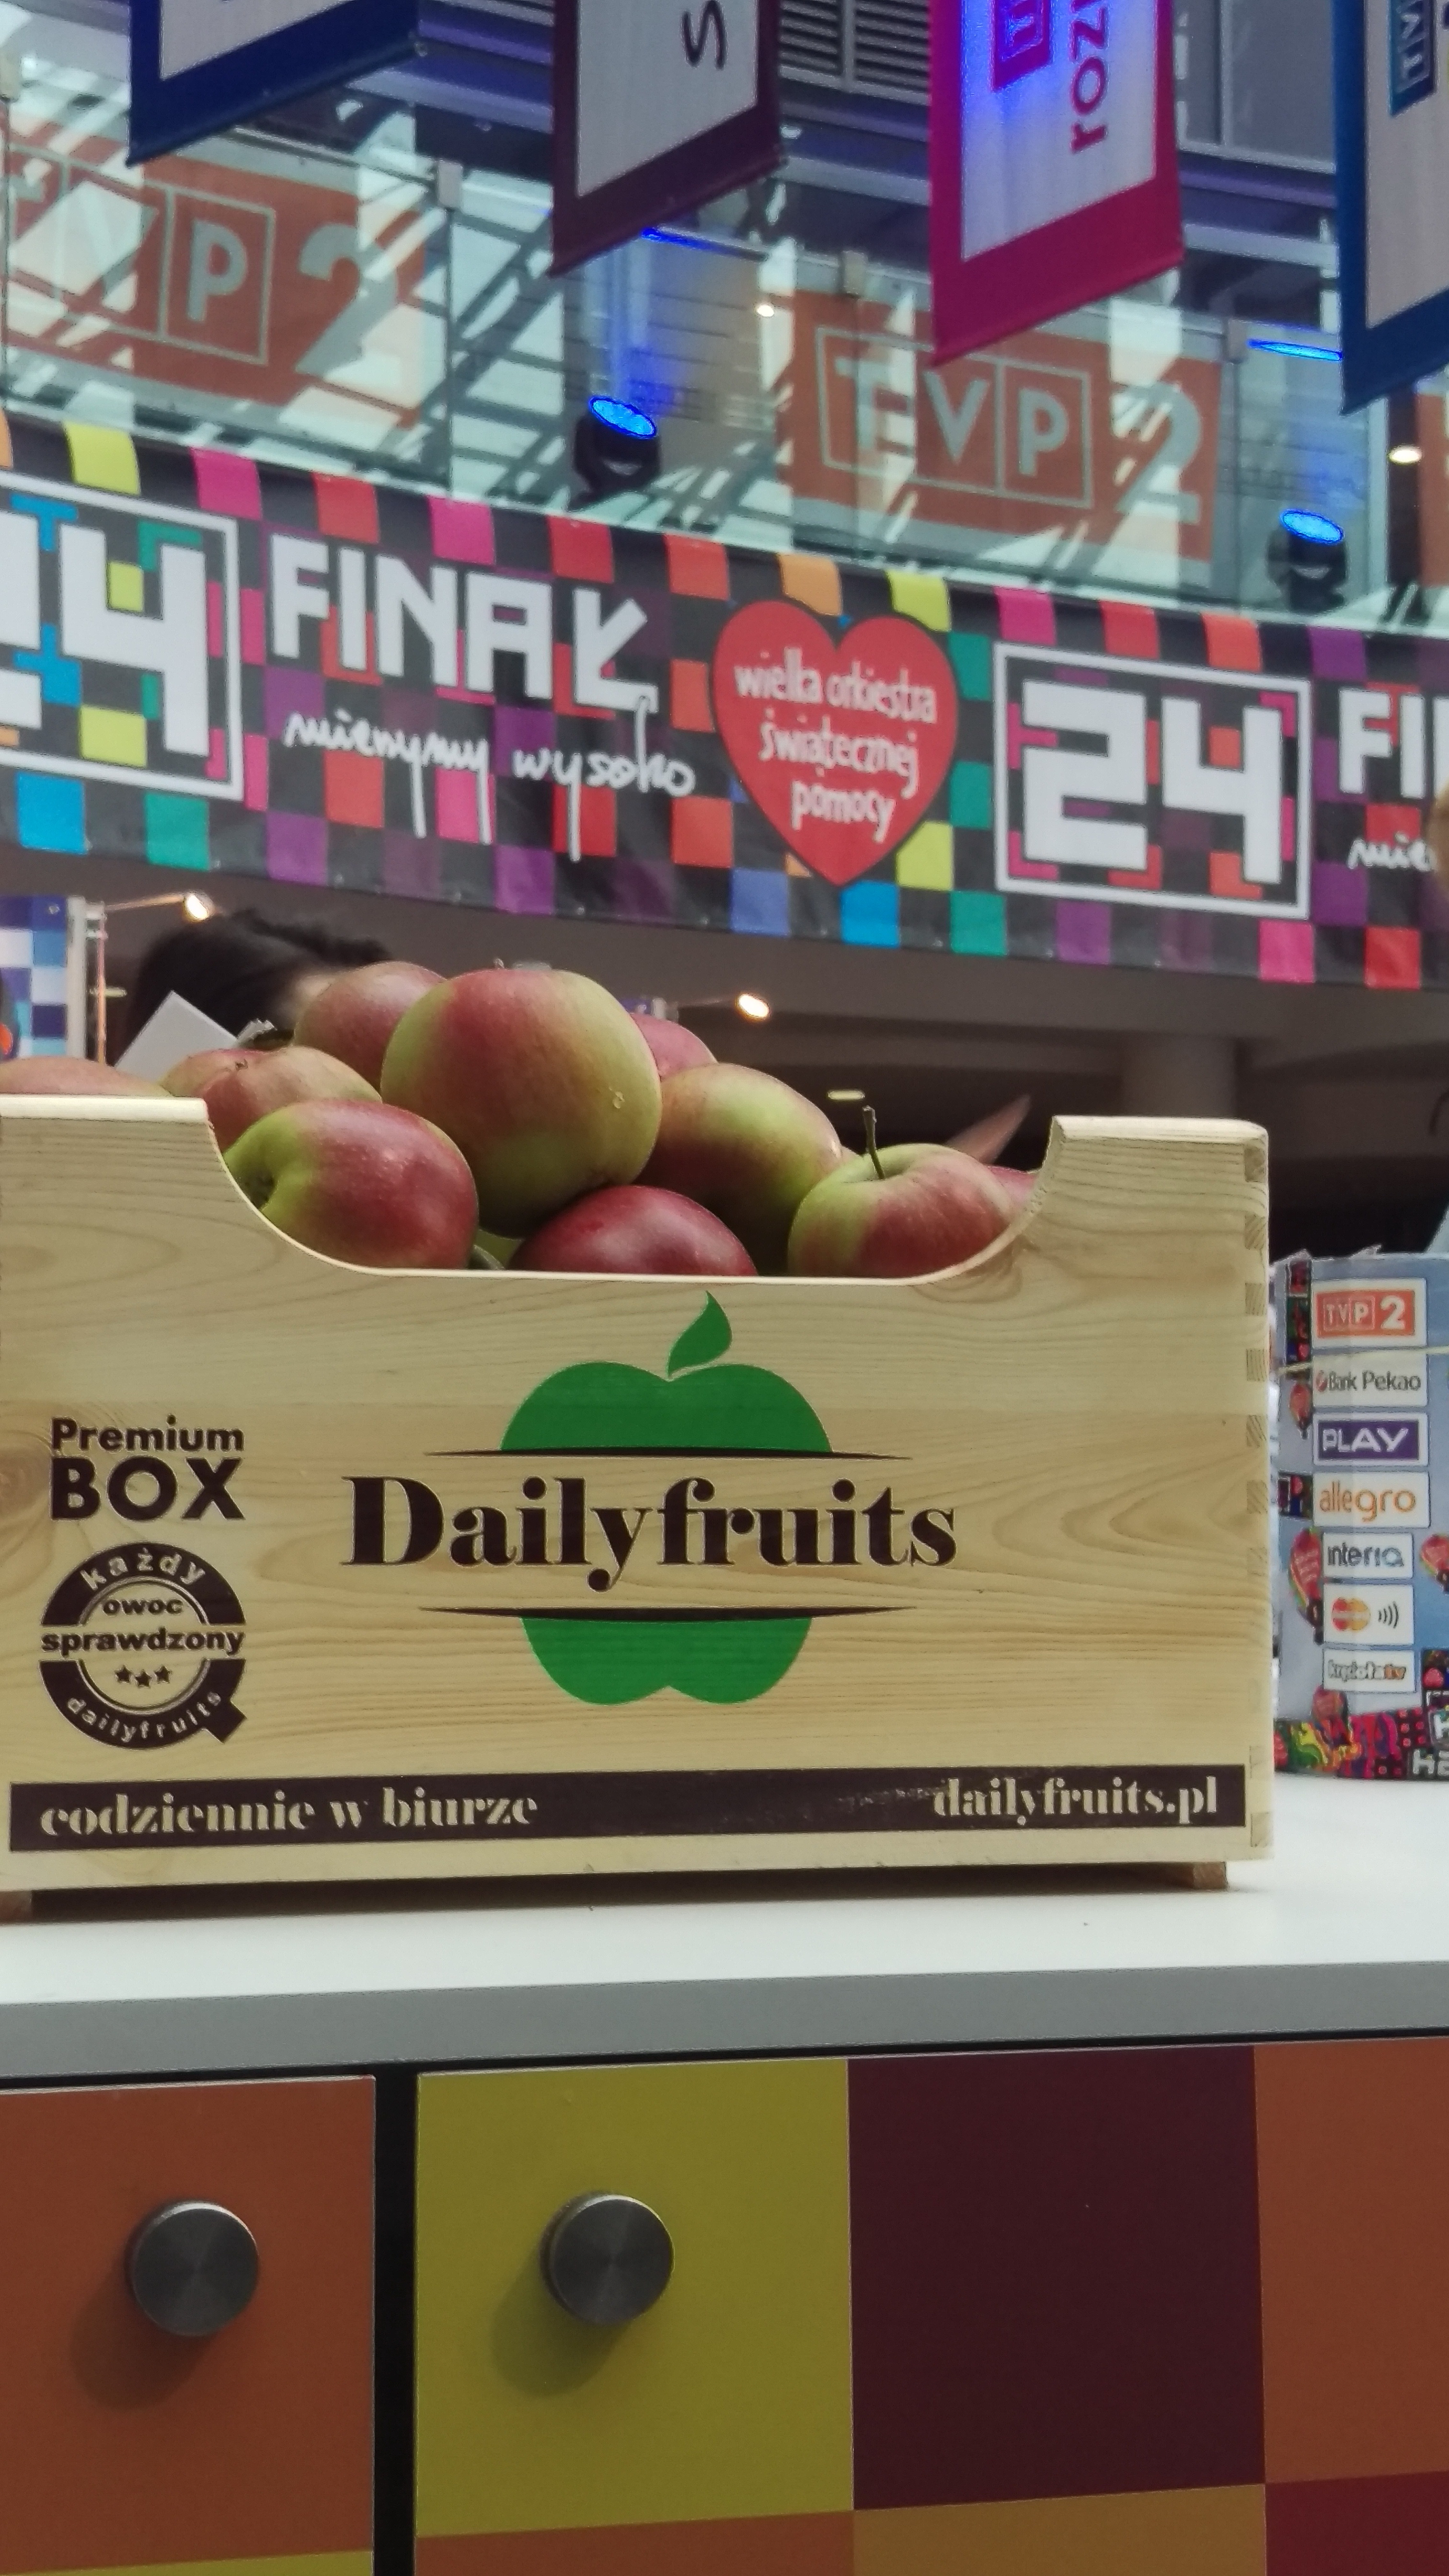 Dailyfruits wspiera i pomaga